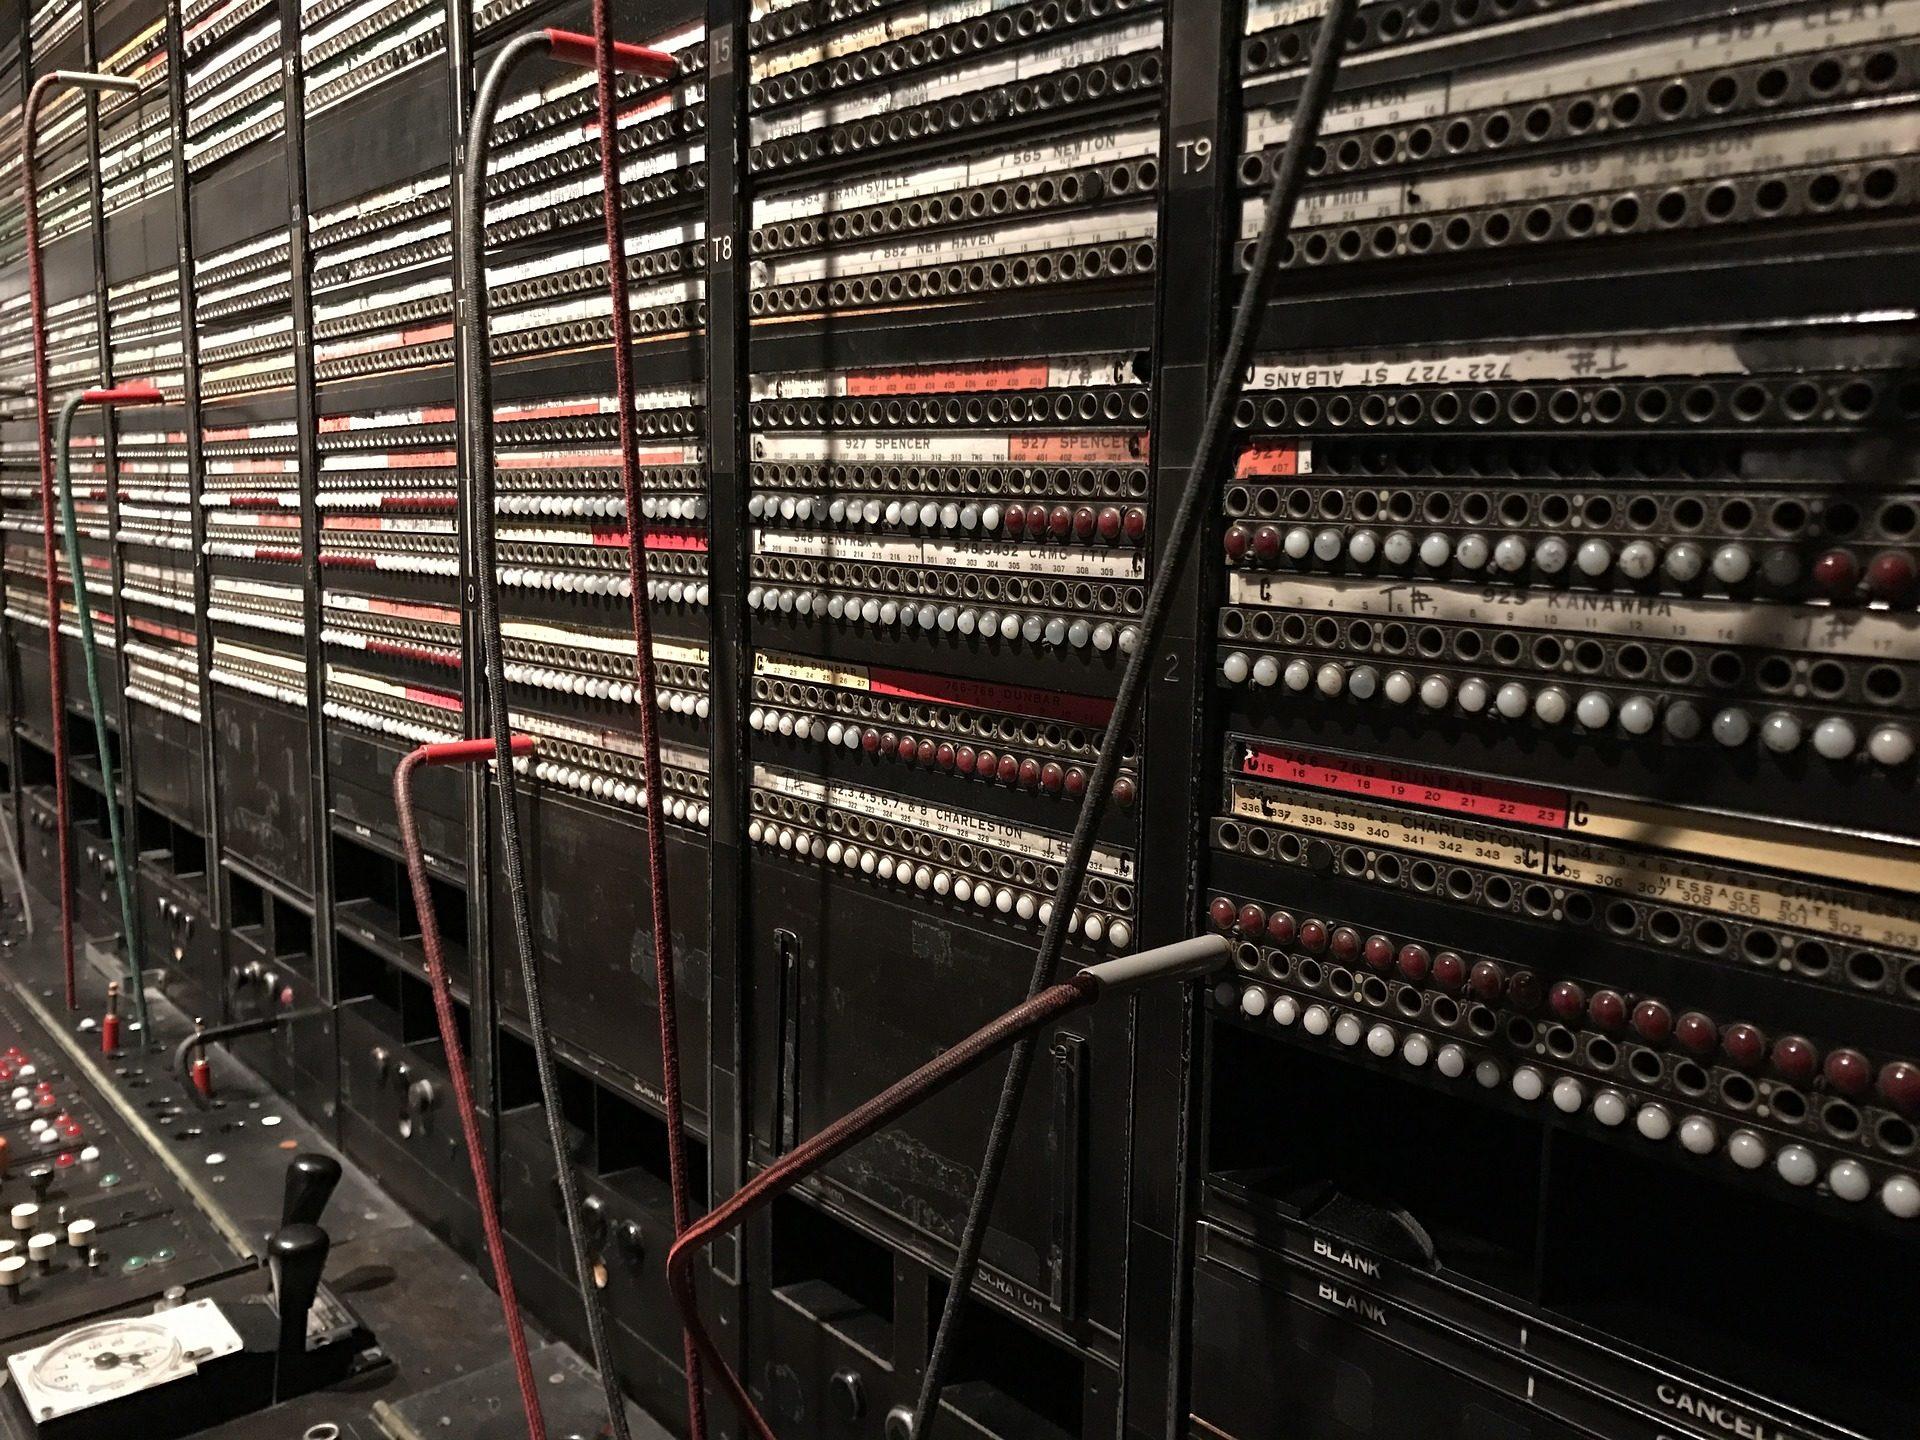 centralita, telefonía, पुराने, केबल, कनेक्शन - HD वॉलपेपर - प्रोफेसर-falken.com